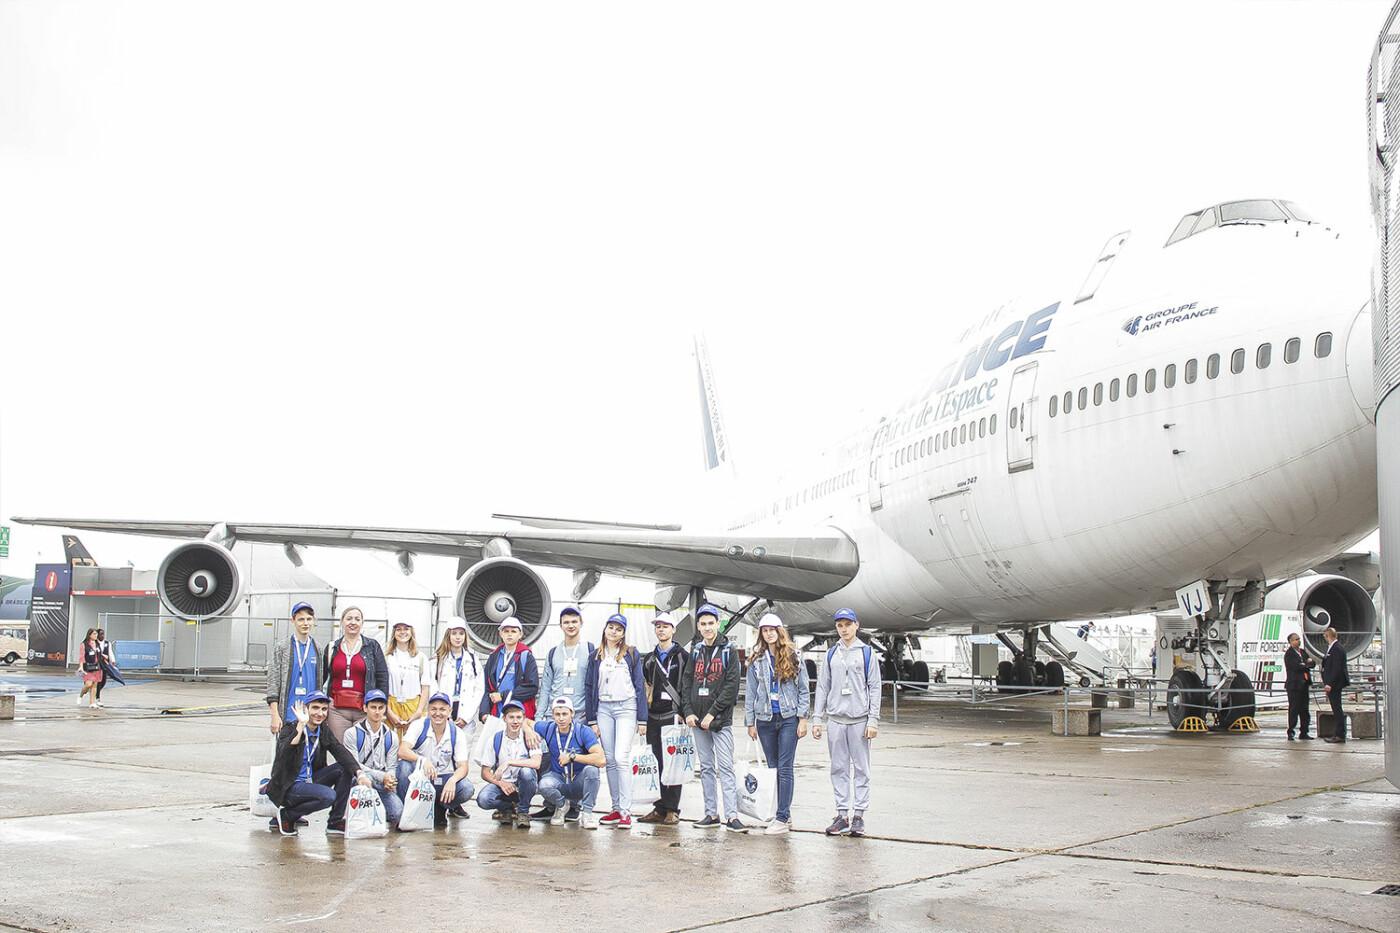 Борис Колесников со школьниками Донбасса посетил крупнейший авиасалон во Франции, фото-5